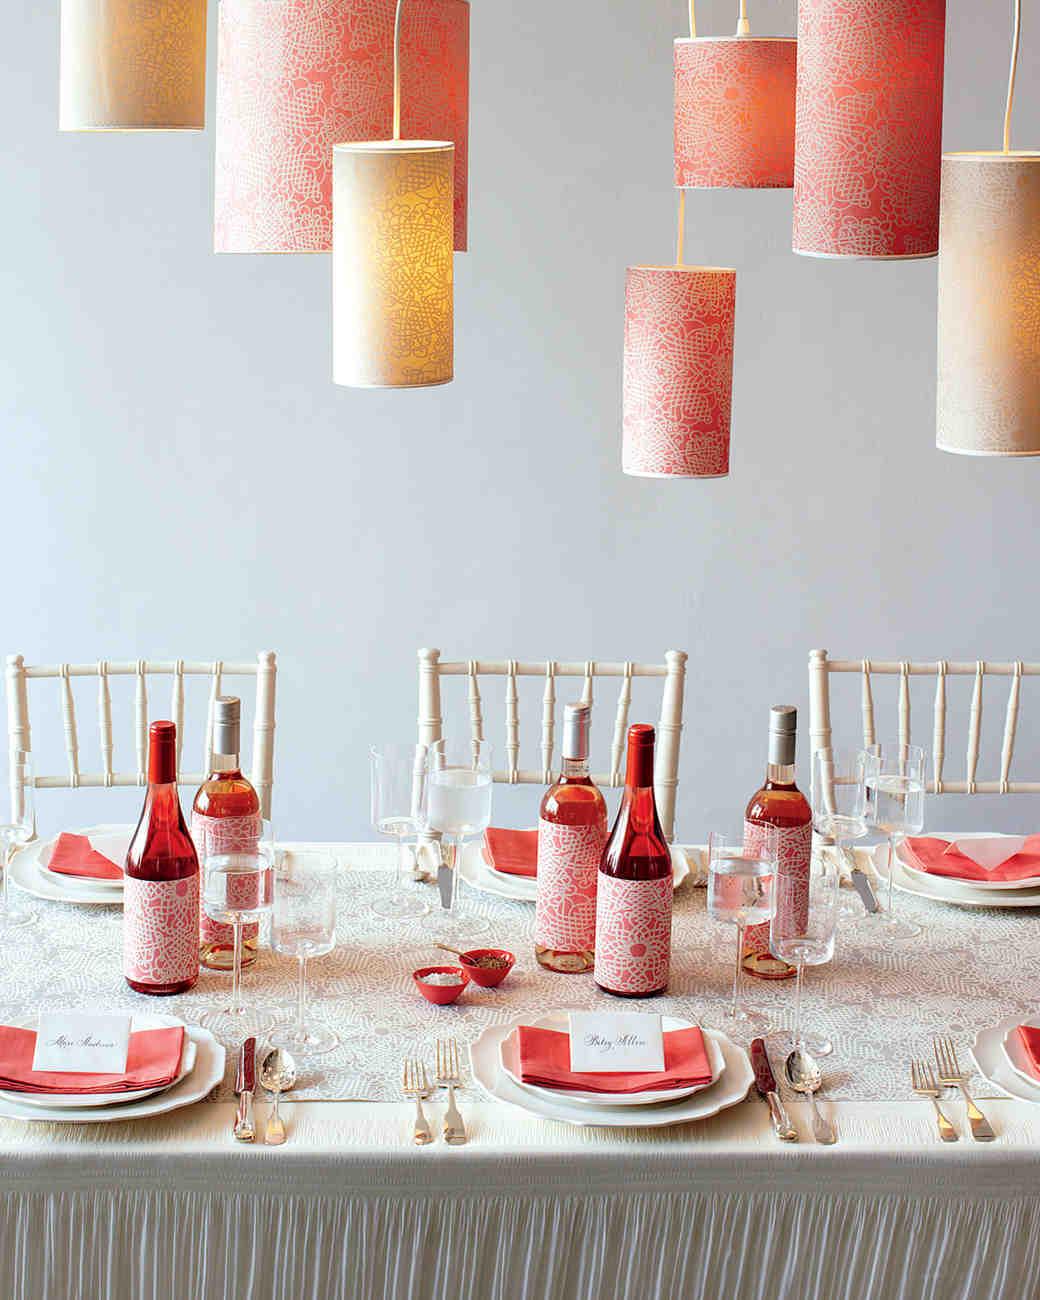 wallpaper-table-mwd107819.jpg